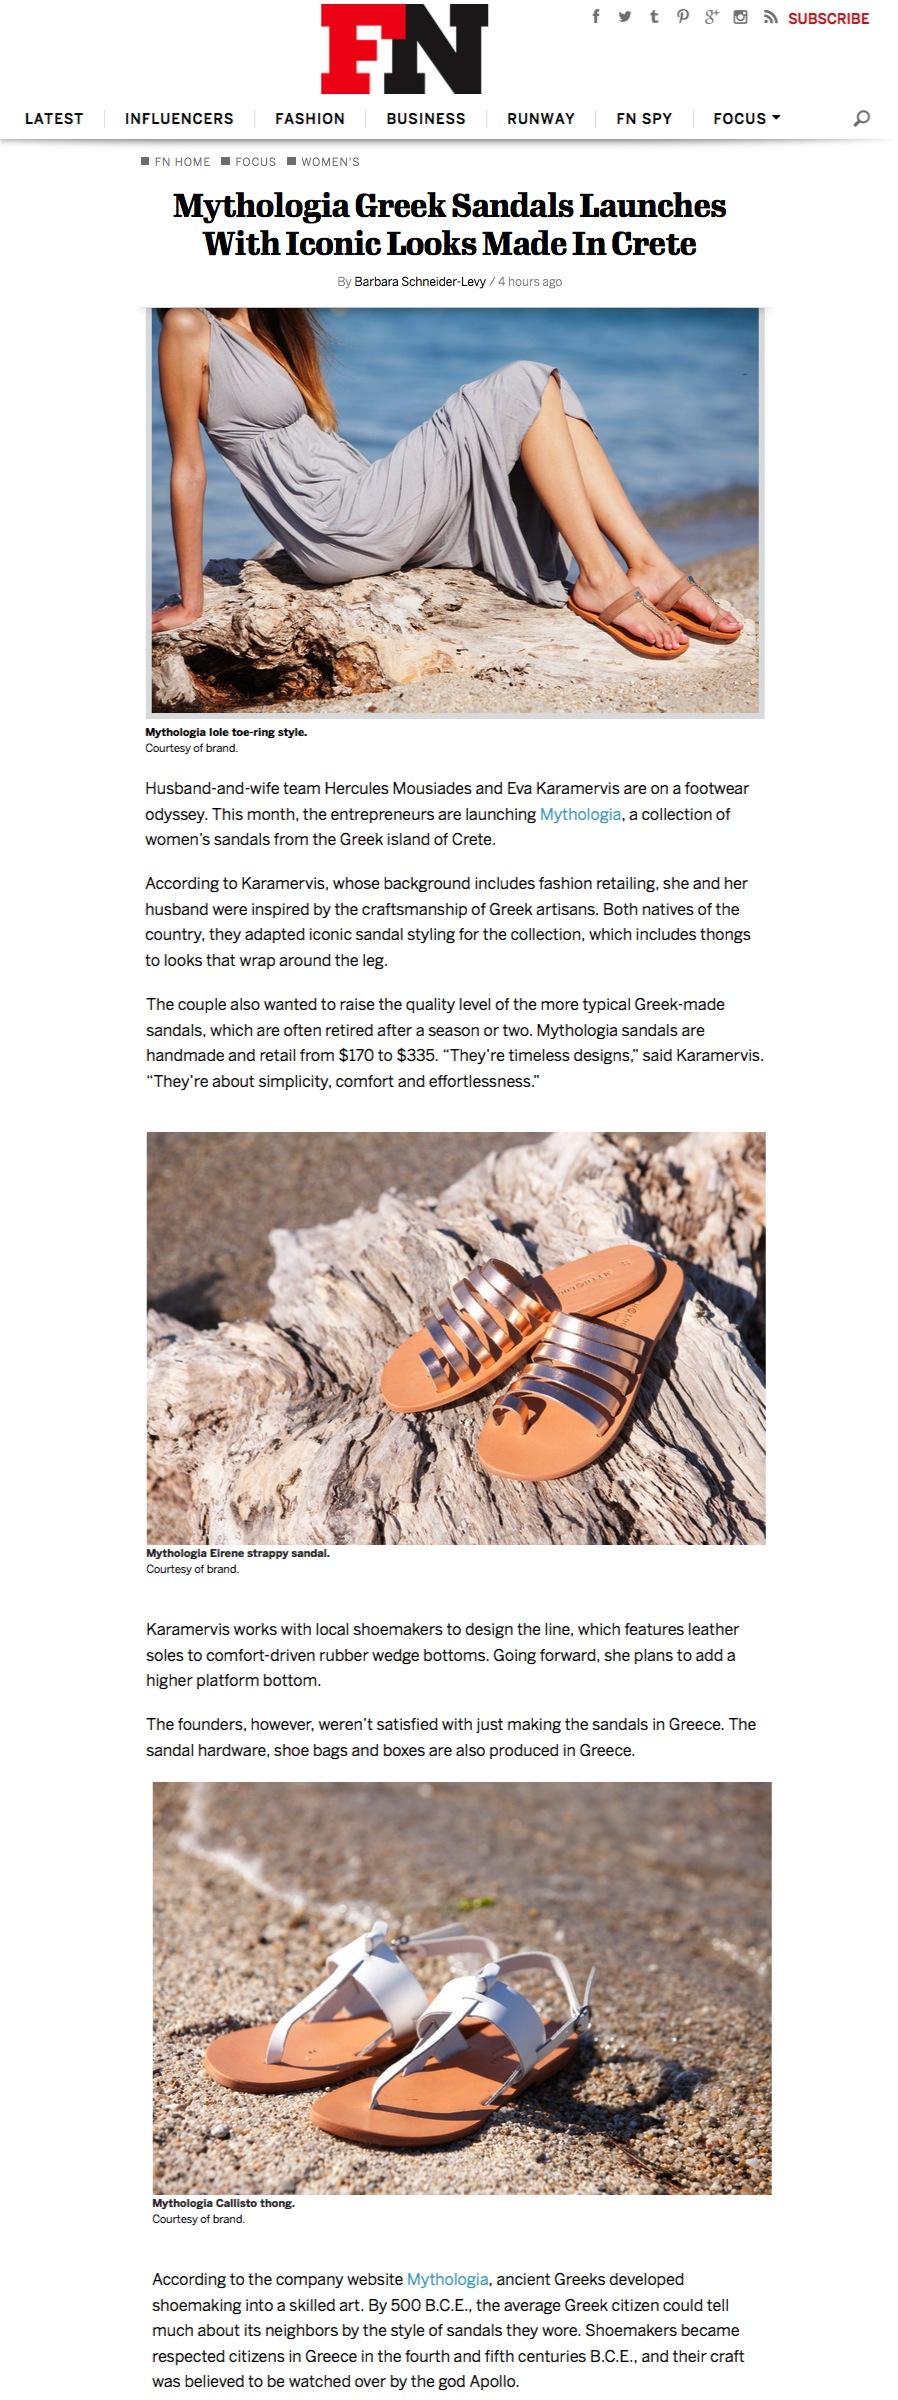 FOOTWEAR NEWS ARTICLE APRIL 2016/ WWW.FOOTWEARNEWS.COM